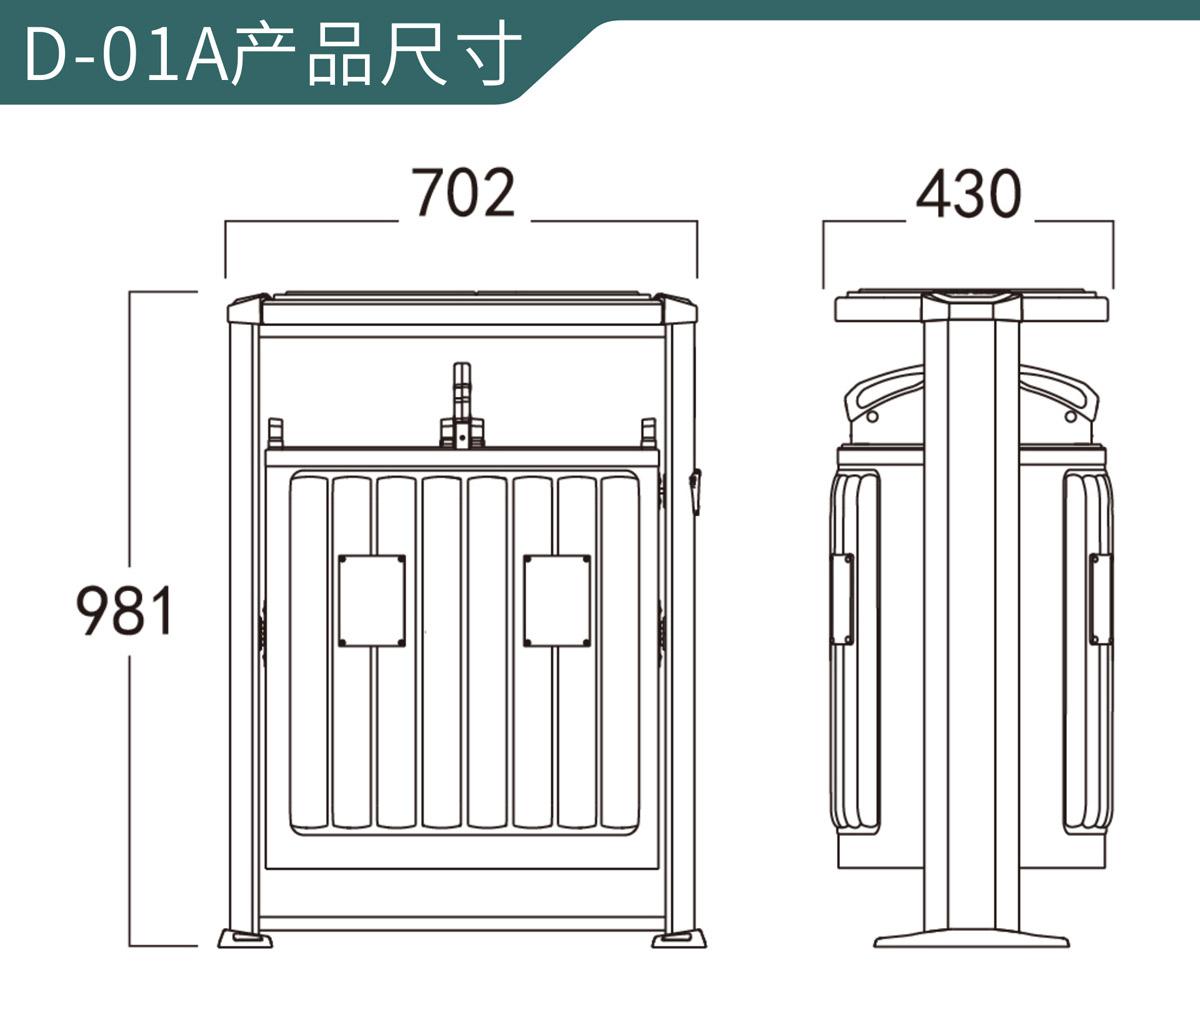 D-01A木纹垃圾桶尺寸图.jpg